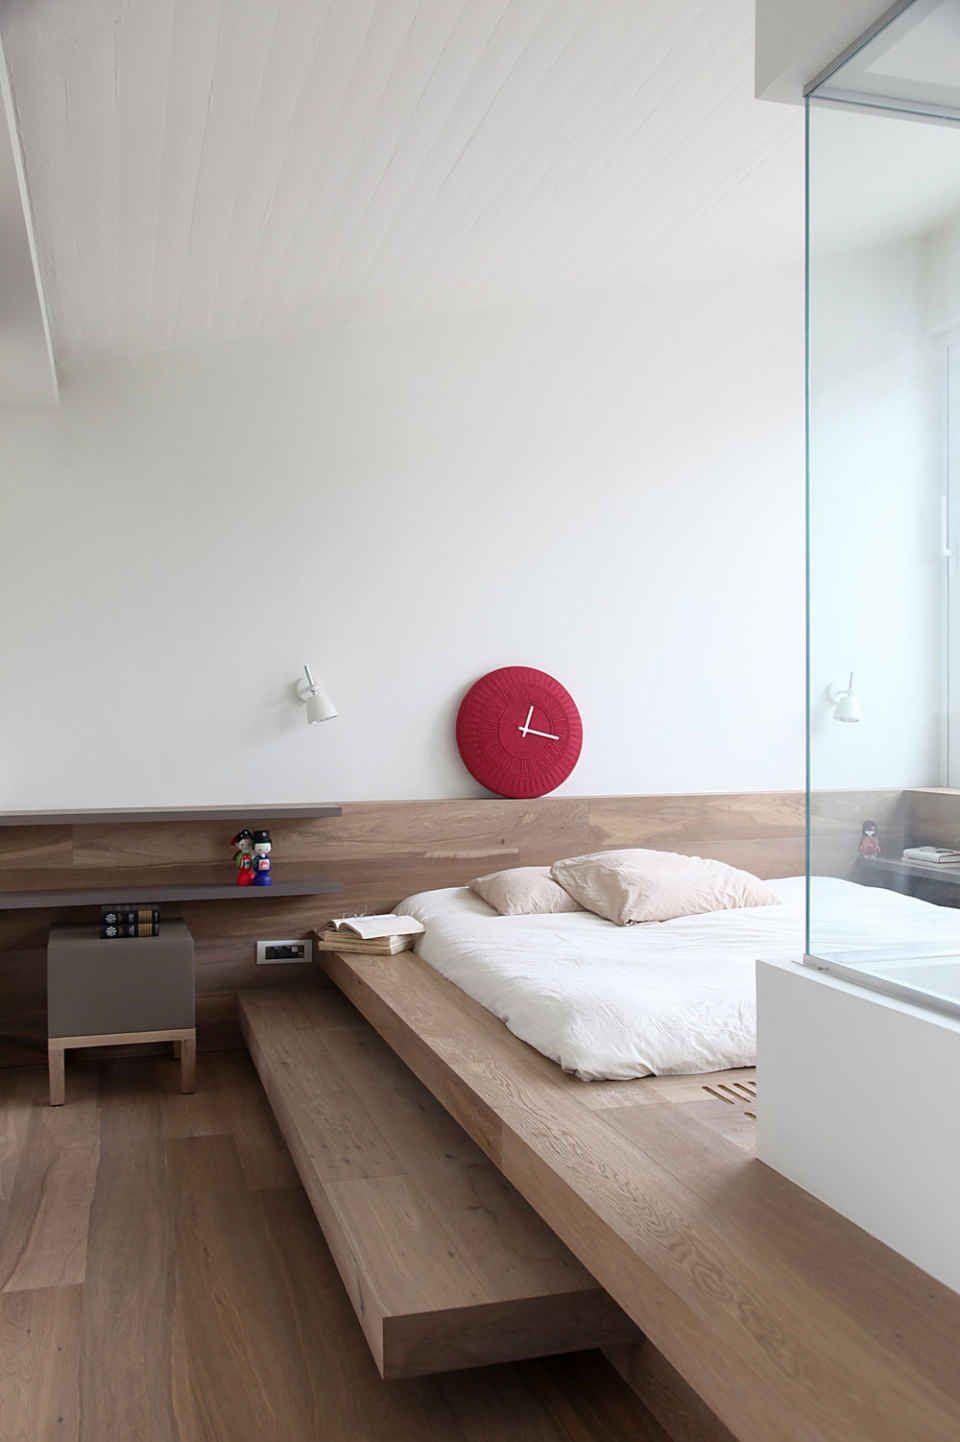 Modern Japanese Bedroom : modern, japanese, bedroom, Minimalistic, Penthouse, Japanese, Styling, Modern, Bedroom, Interior,, Minimalist, Design,, Style